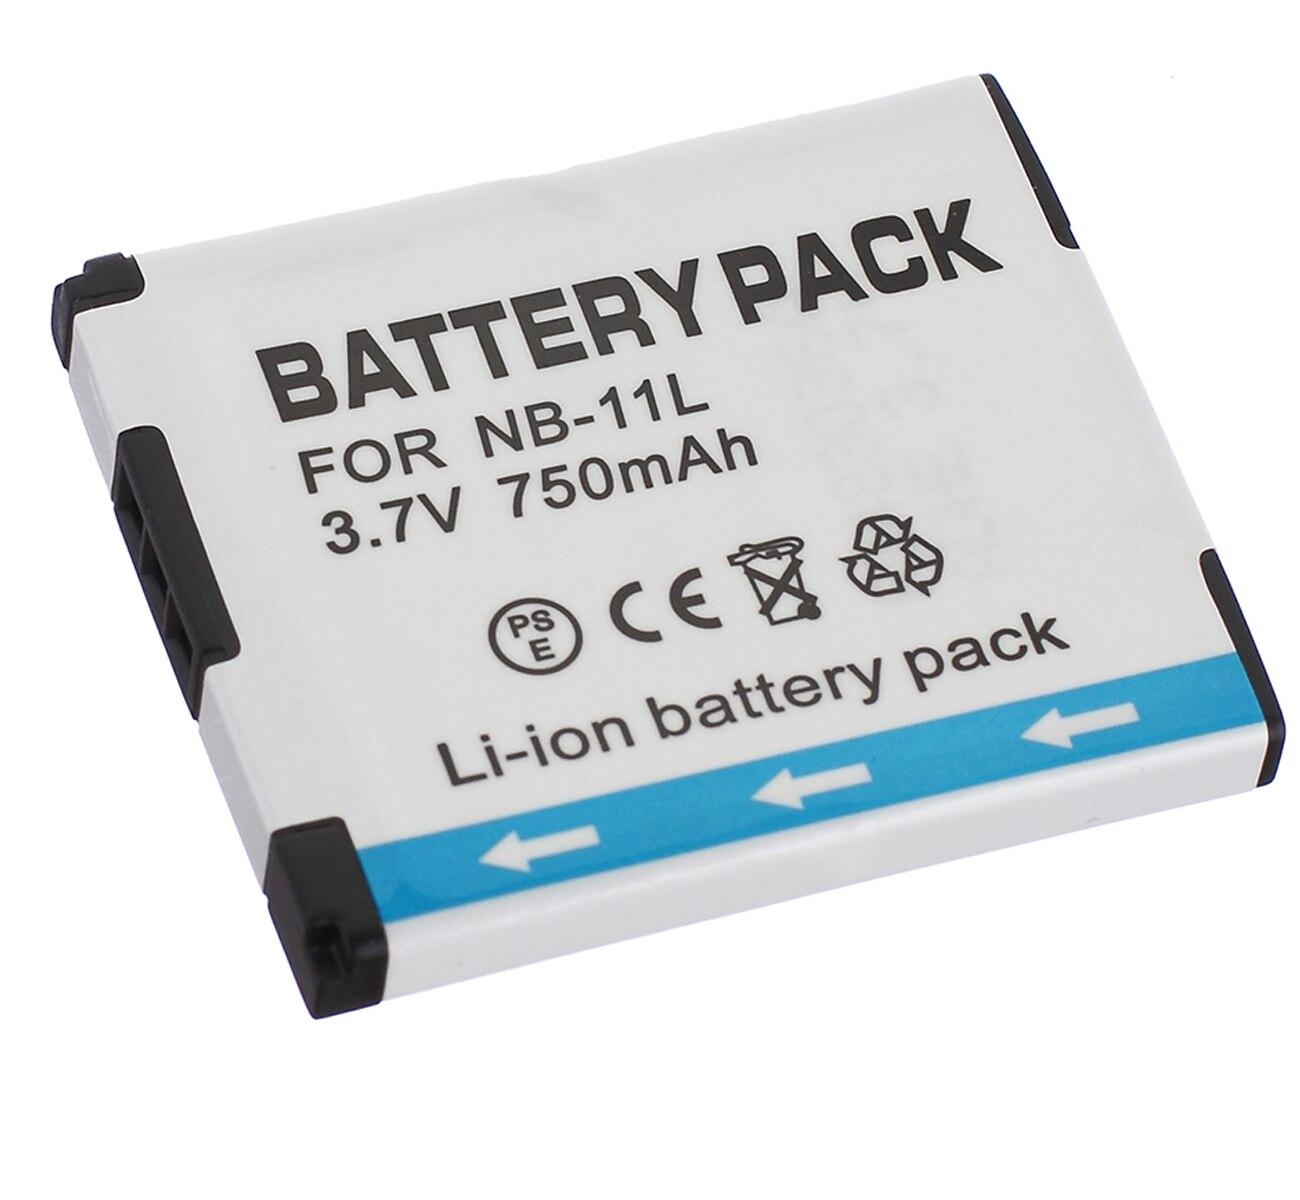 Pack de bateria para Canon IXUS 132, 135, 140, 145, 150, 155, 160, 162,165, IXUS 170, 172, 175, 177, 180, 185, 190 Câmera Digital